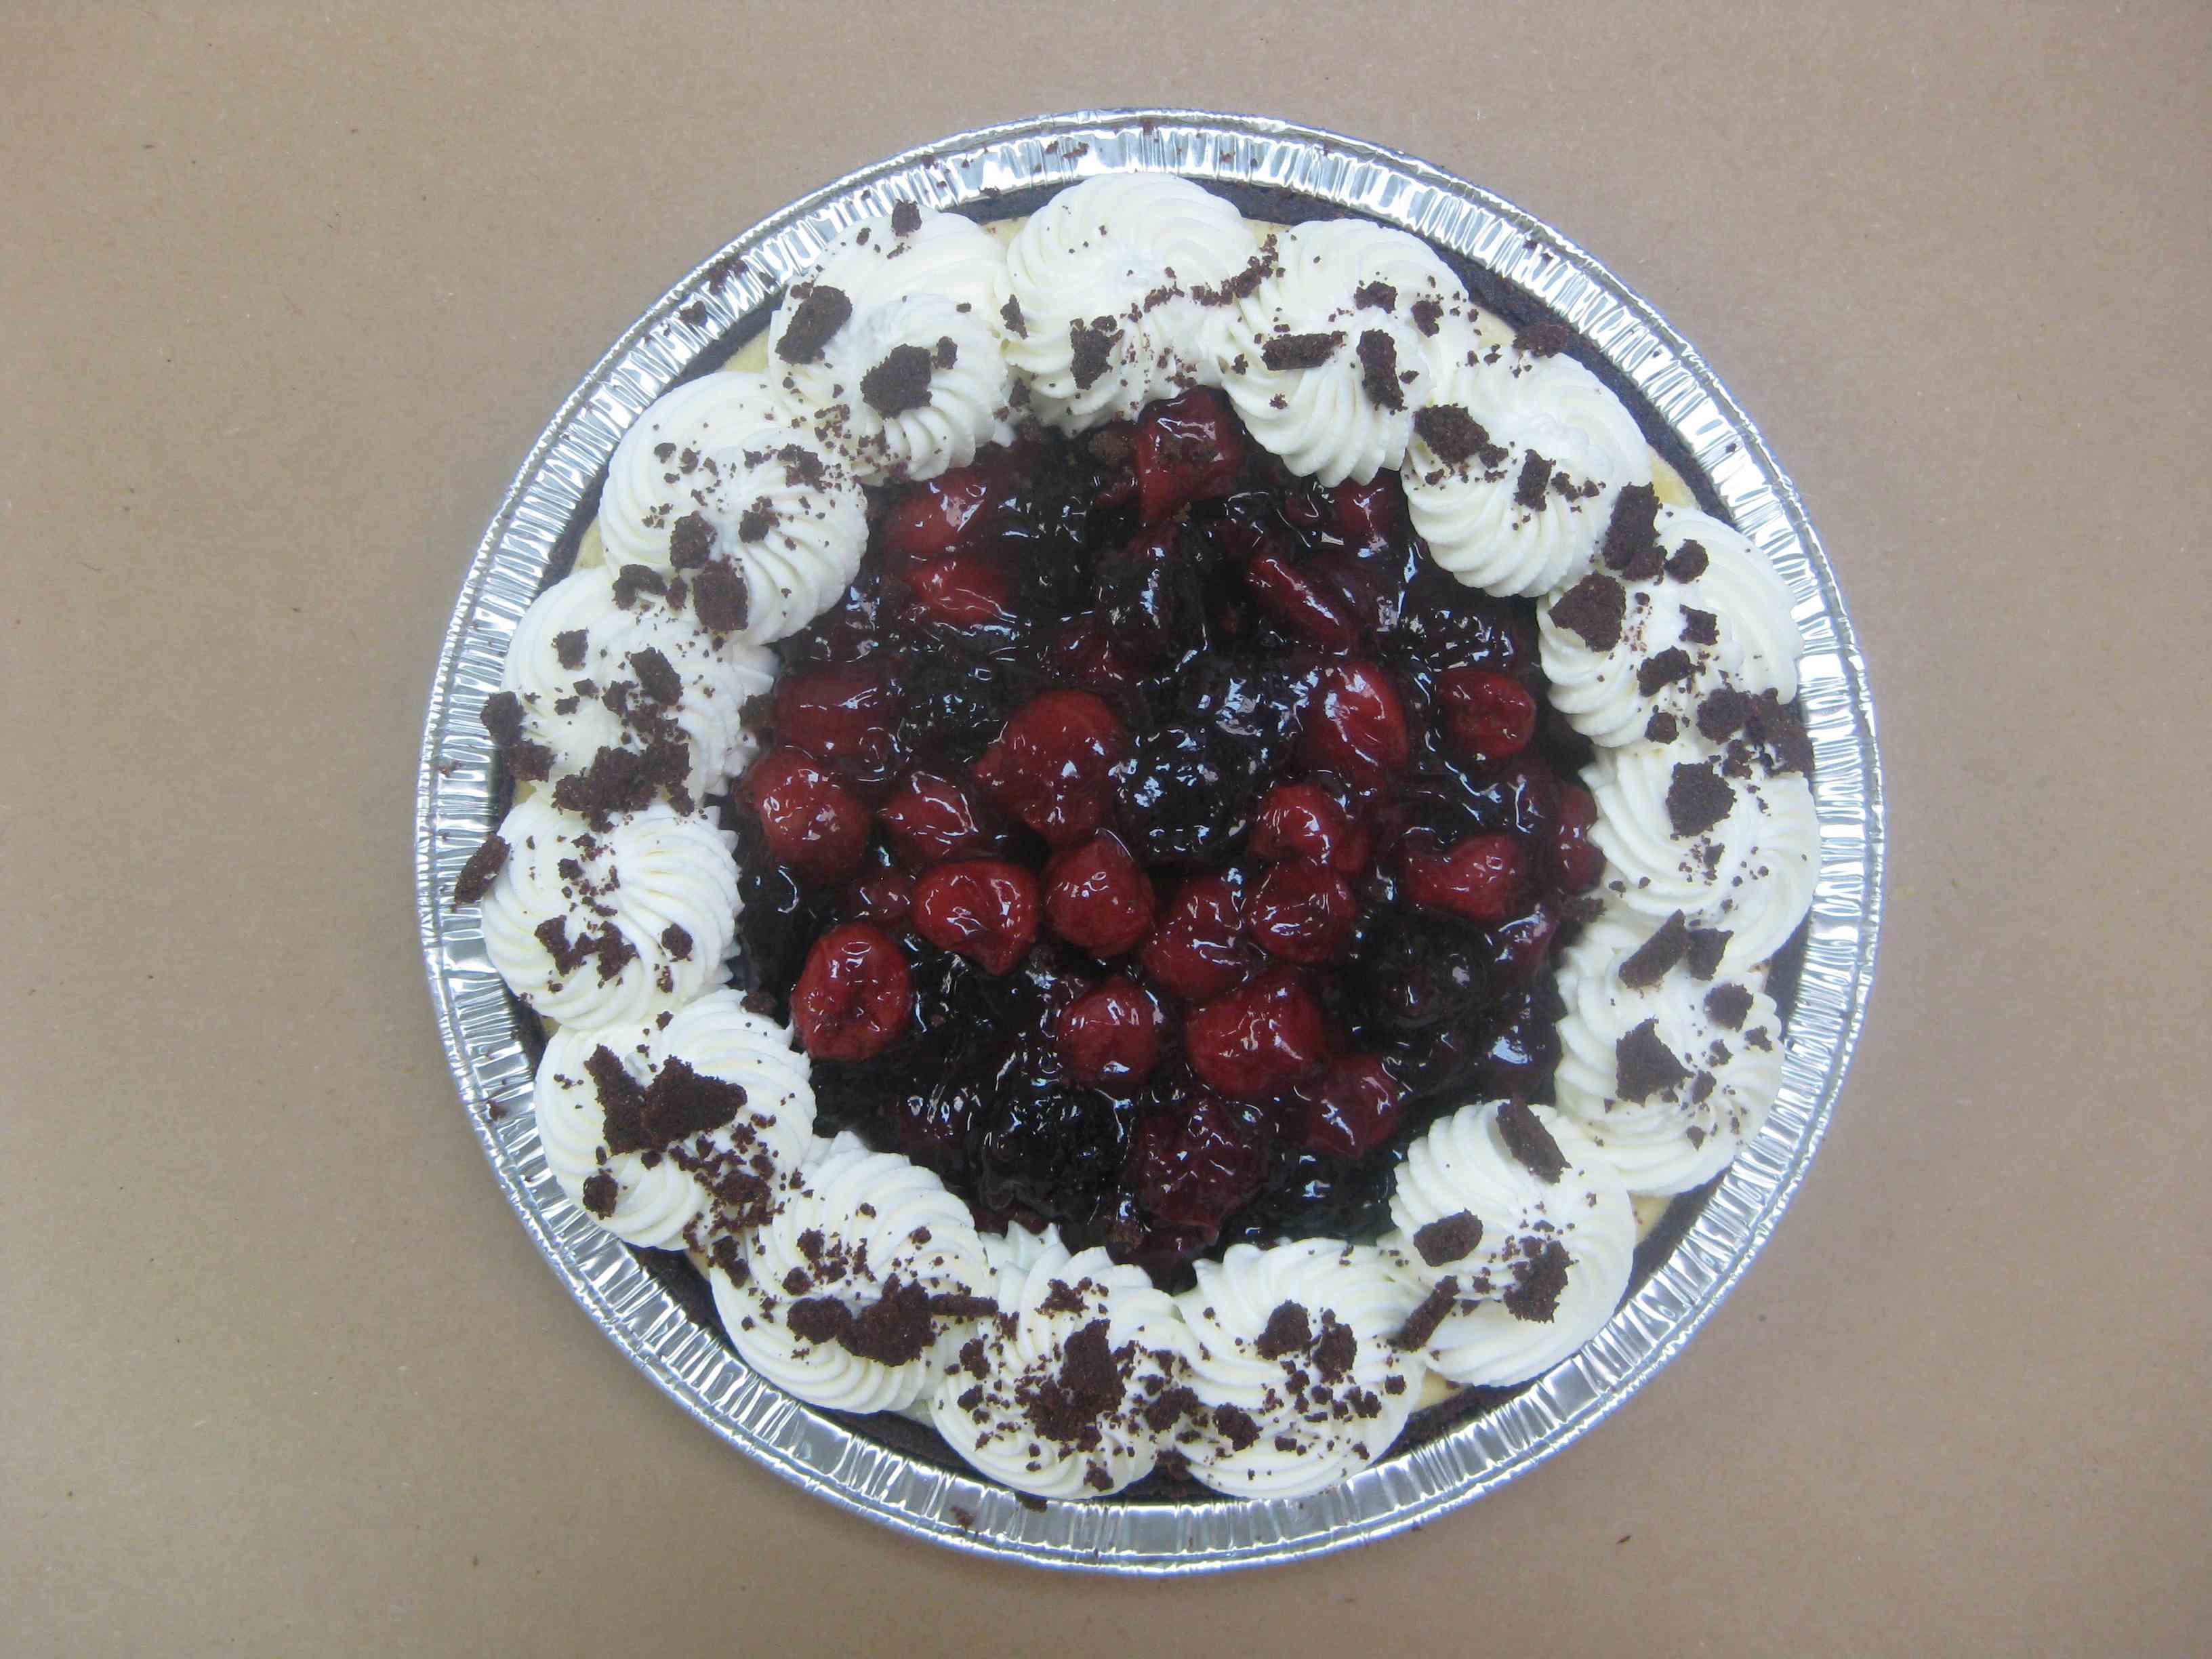 Bonerts open cherry pie